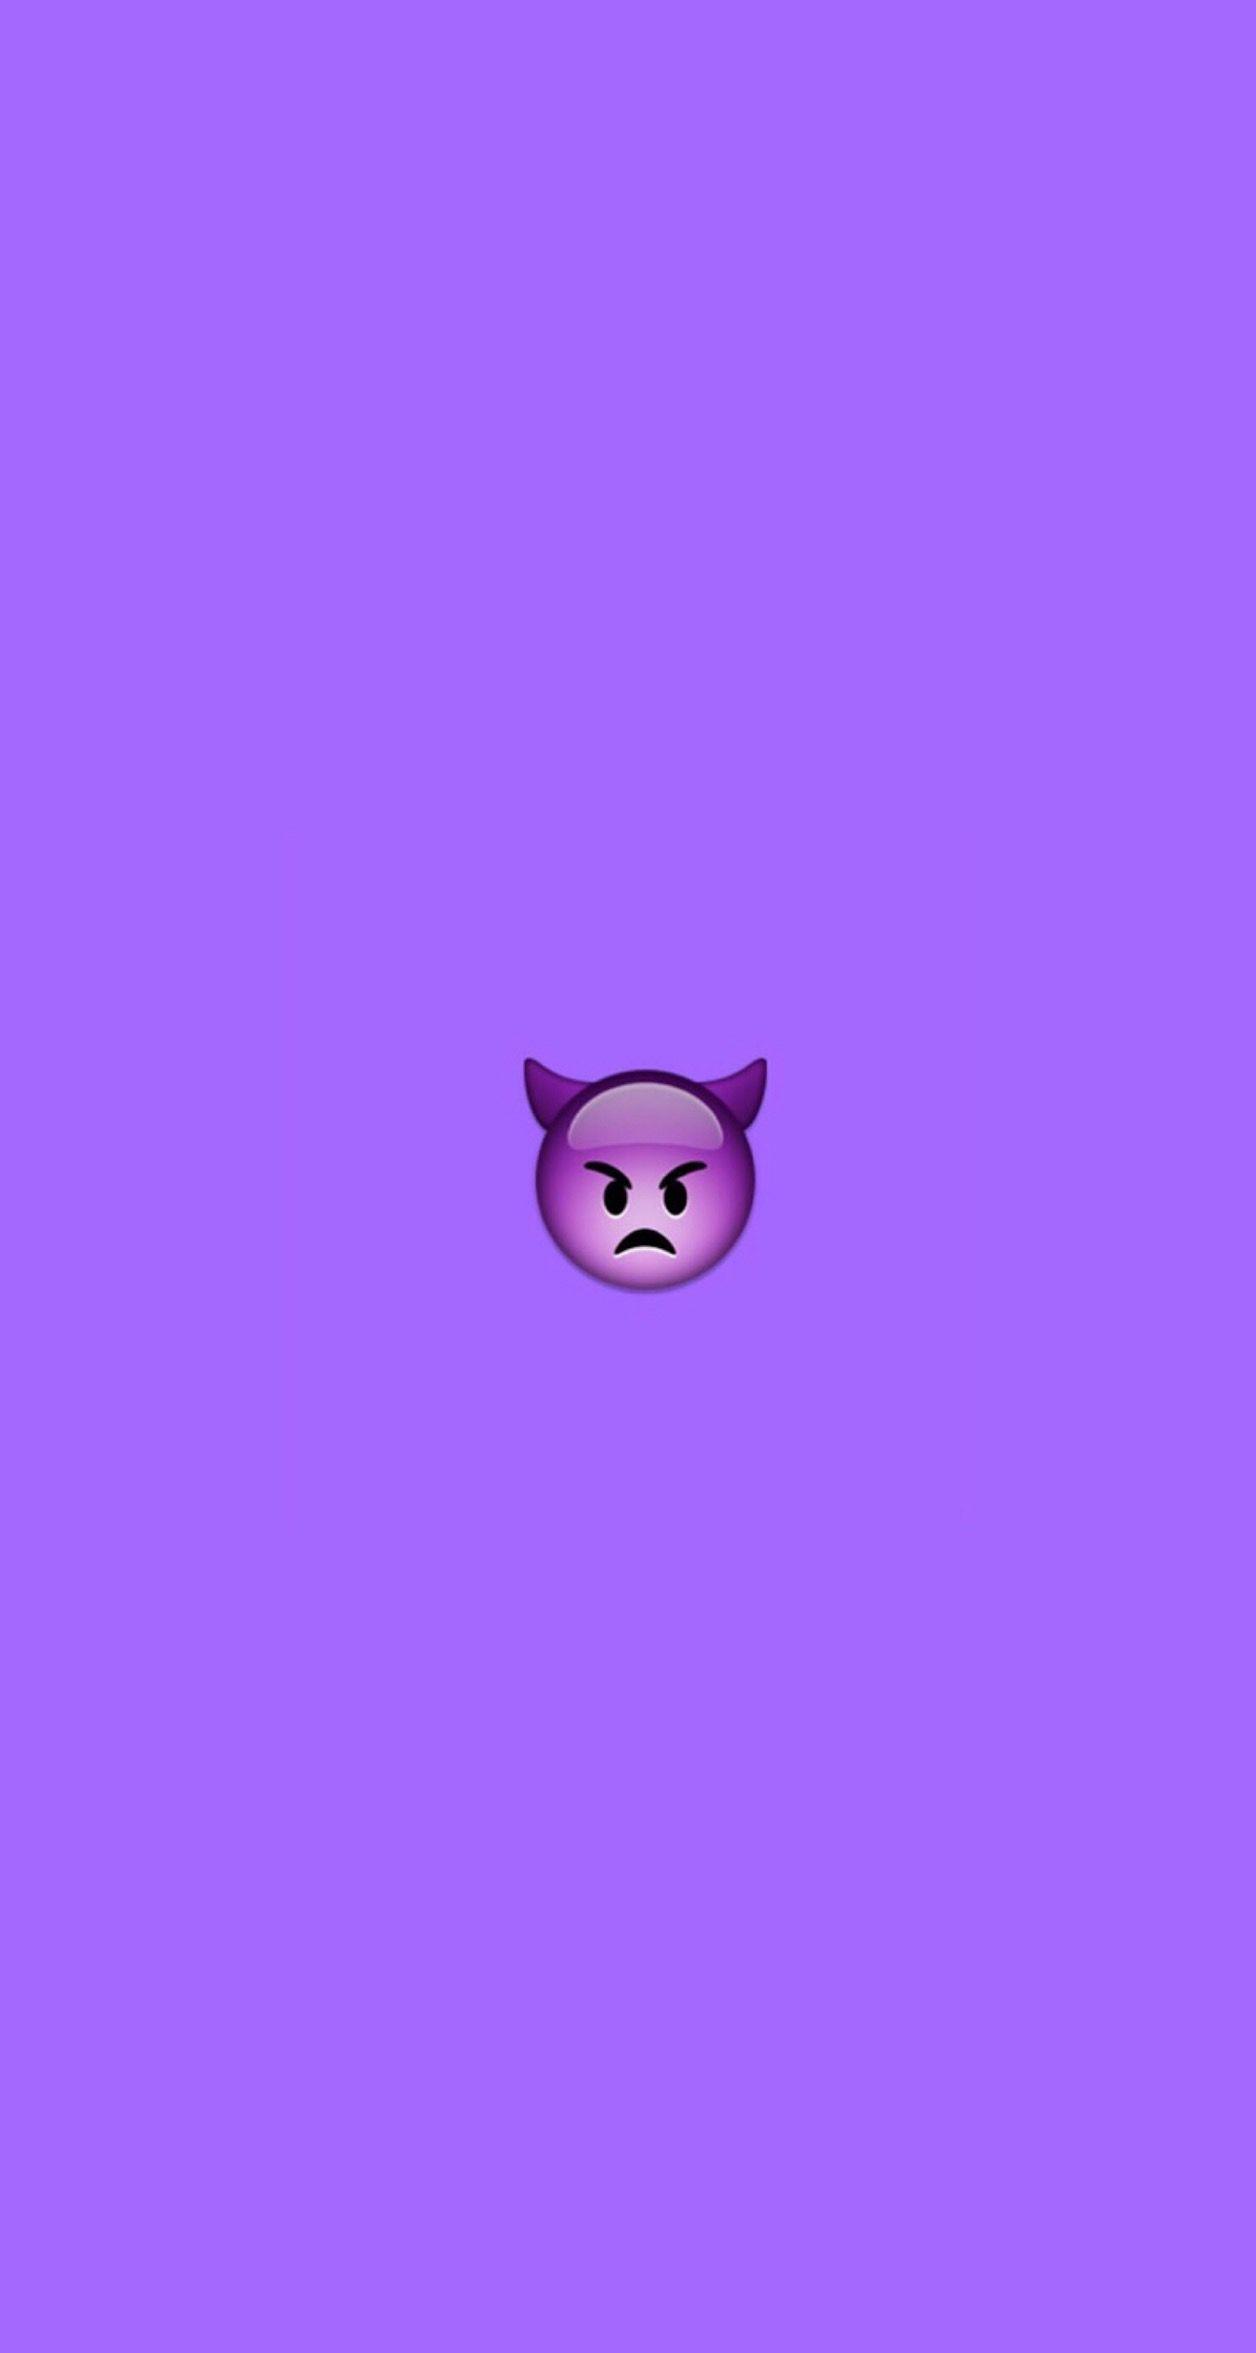 pin by on wallpaper vol 35 emoji